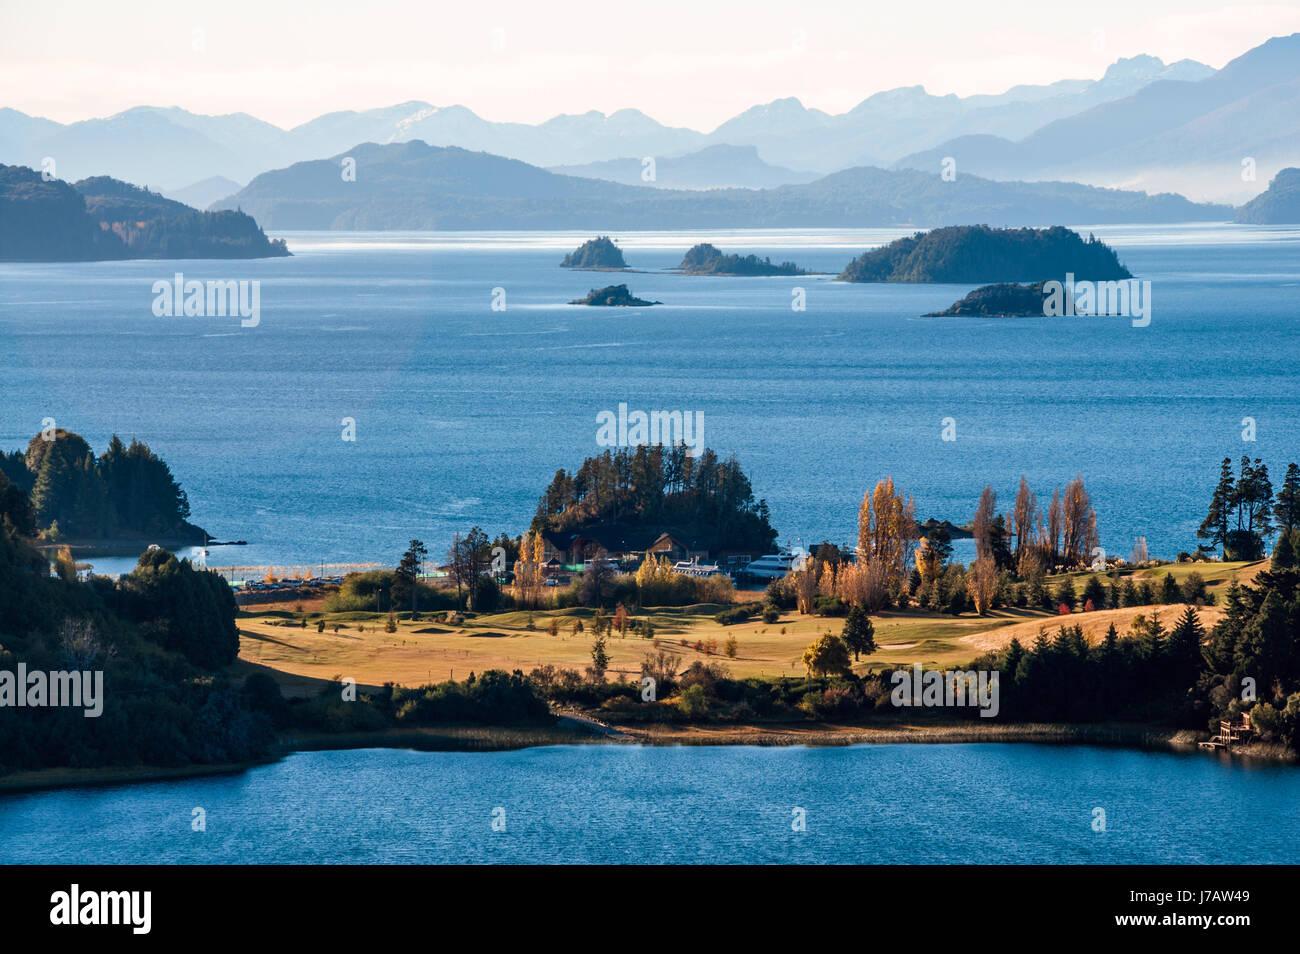 Nahuel Huapi lake, Patagonia Argentina, near Bariloche - Stock Image